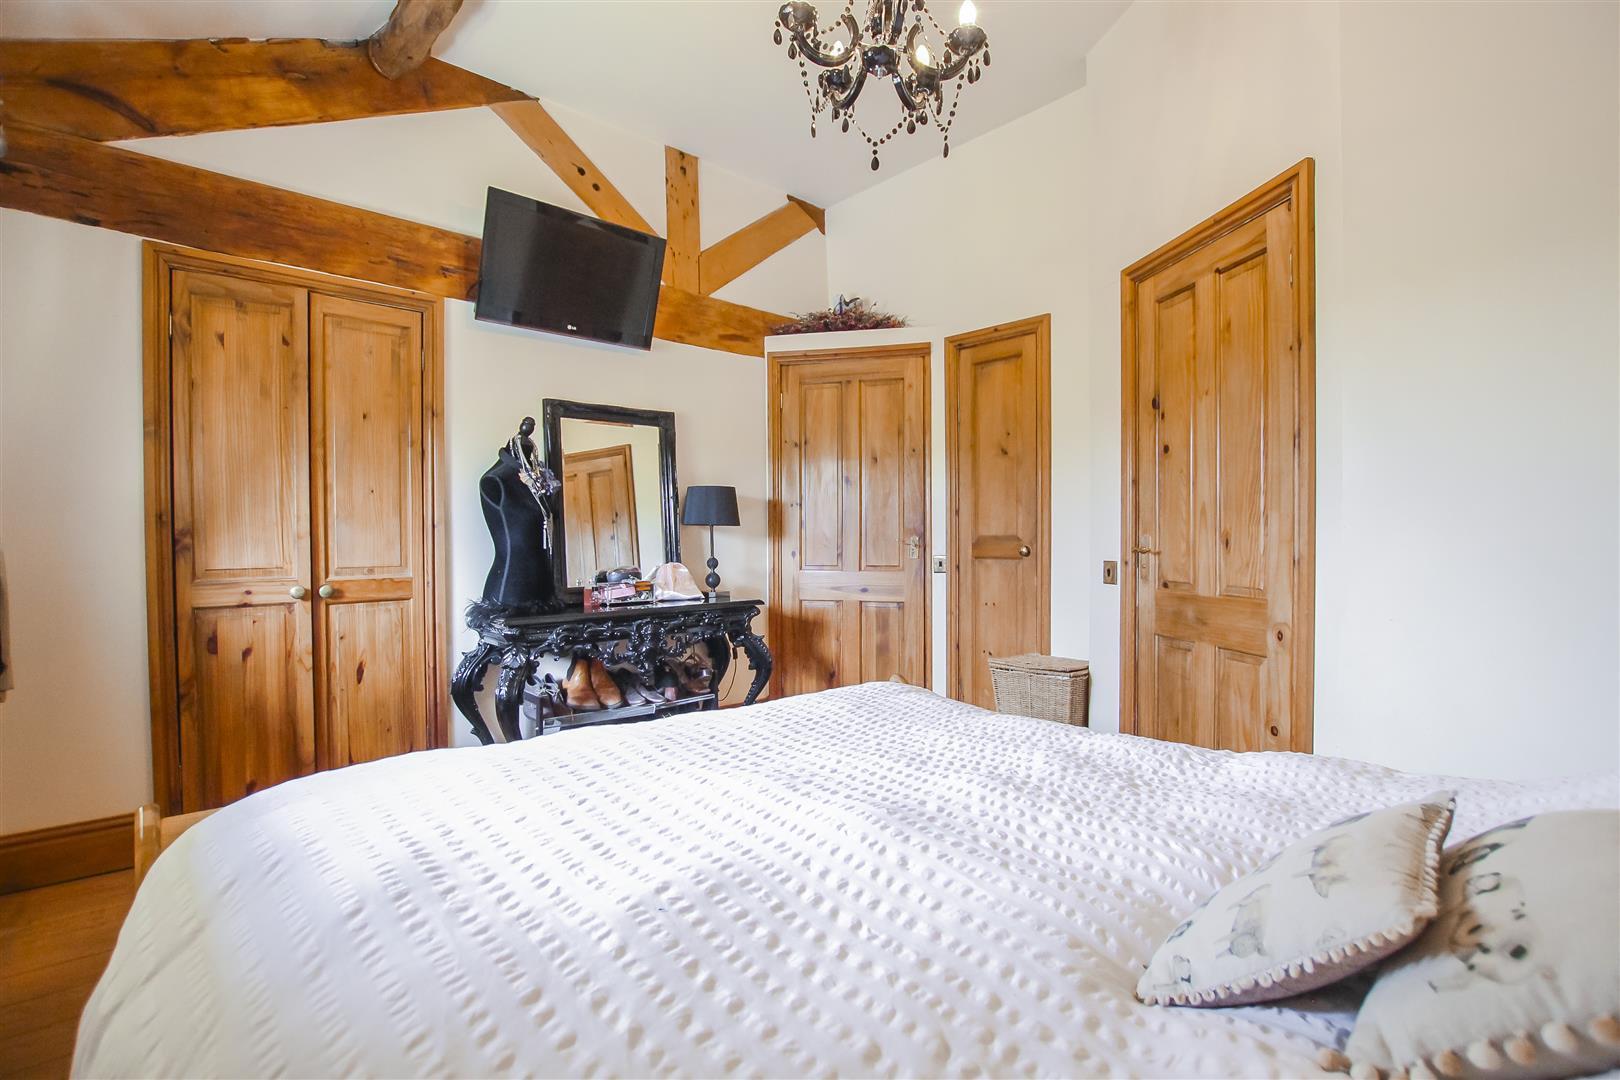 4 Bedroom Semi-detached House For Sale - Image 57